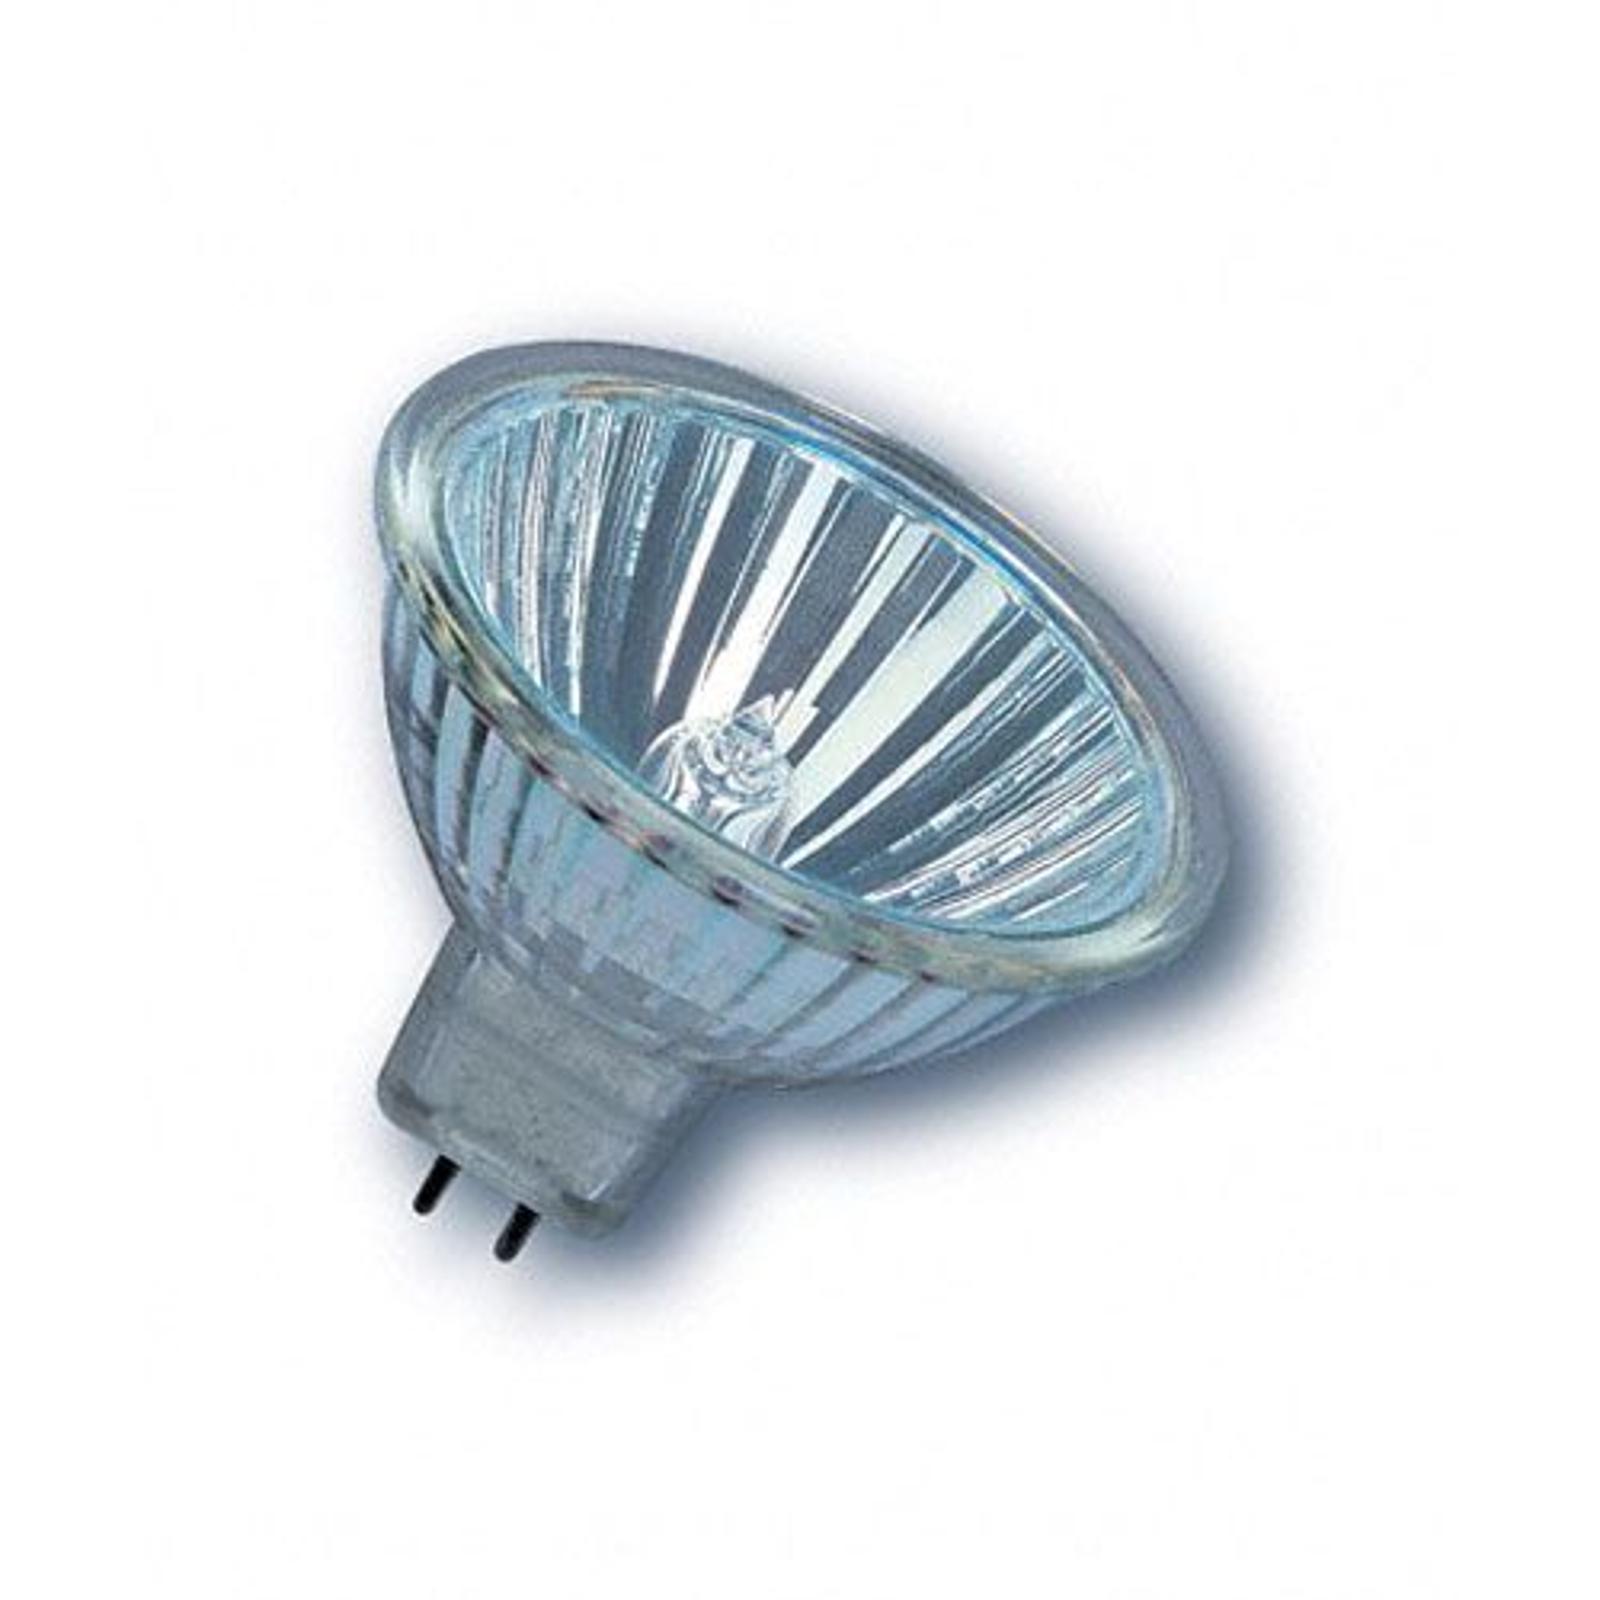 GU5,3 MR16 ampoule halogène Decostar 51, 50 W, 36